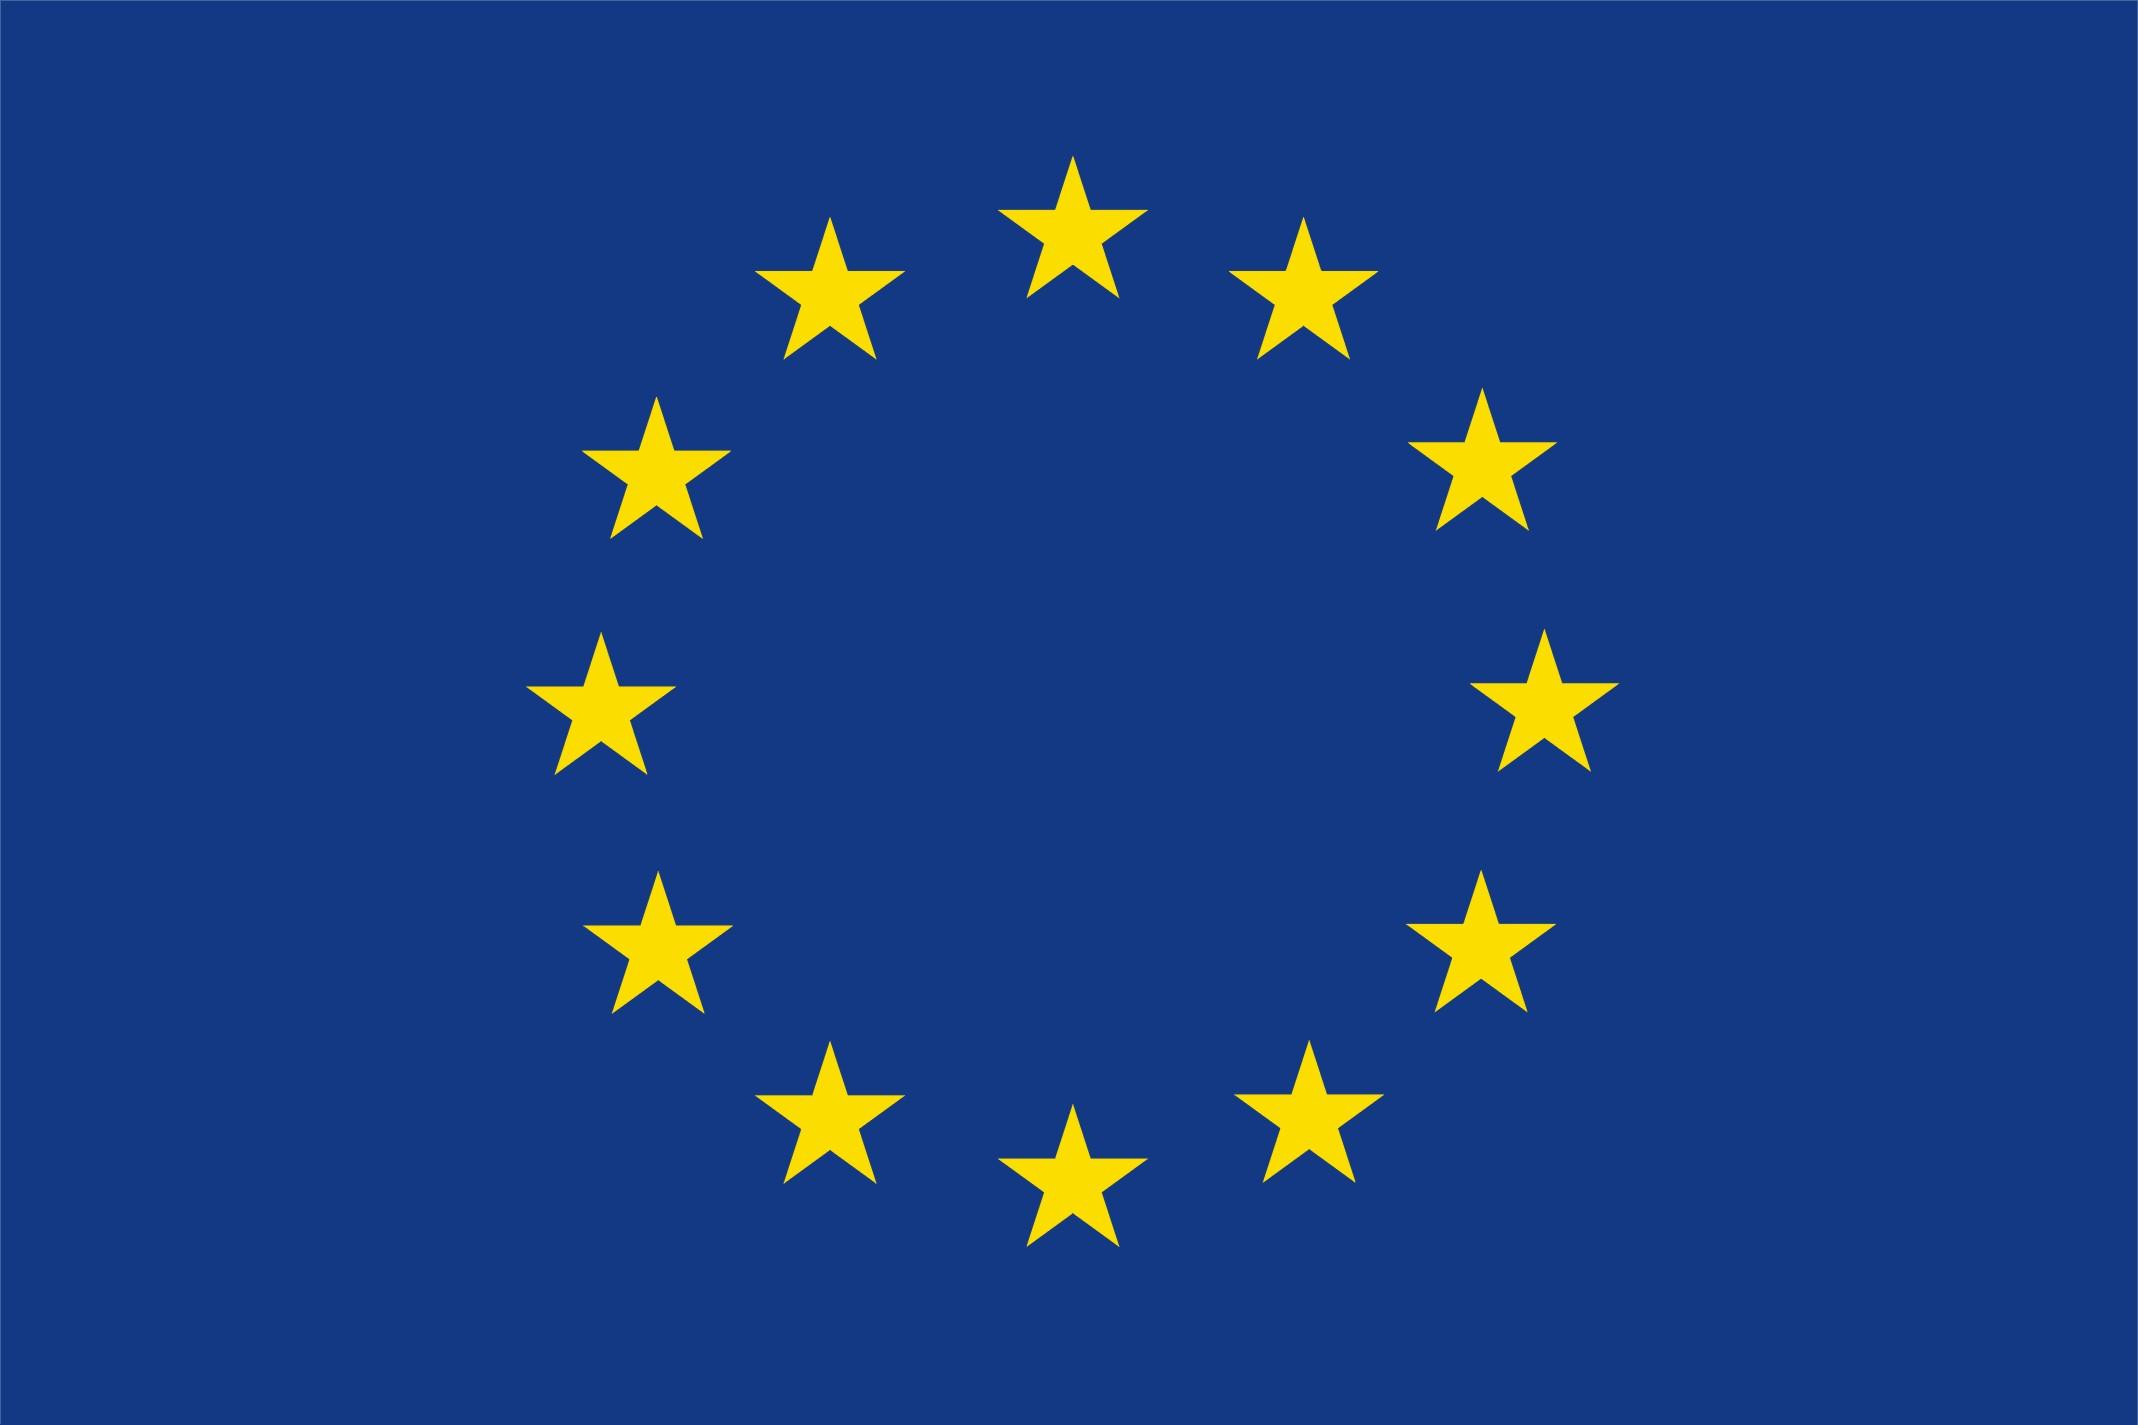 logo-unione-europea-2.jpg